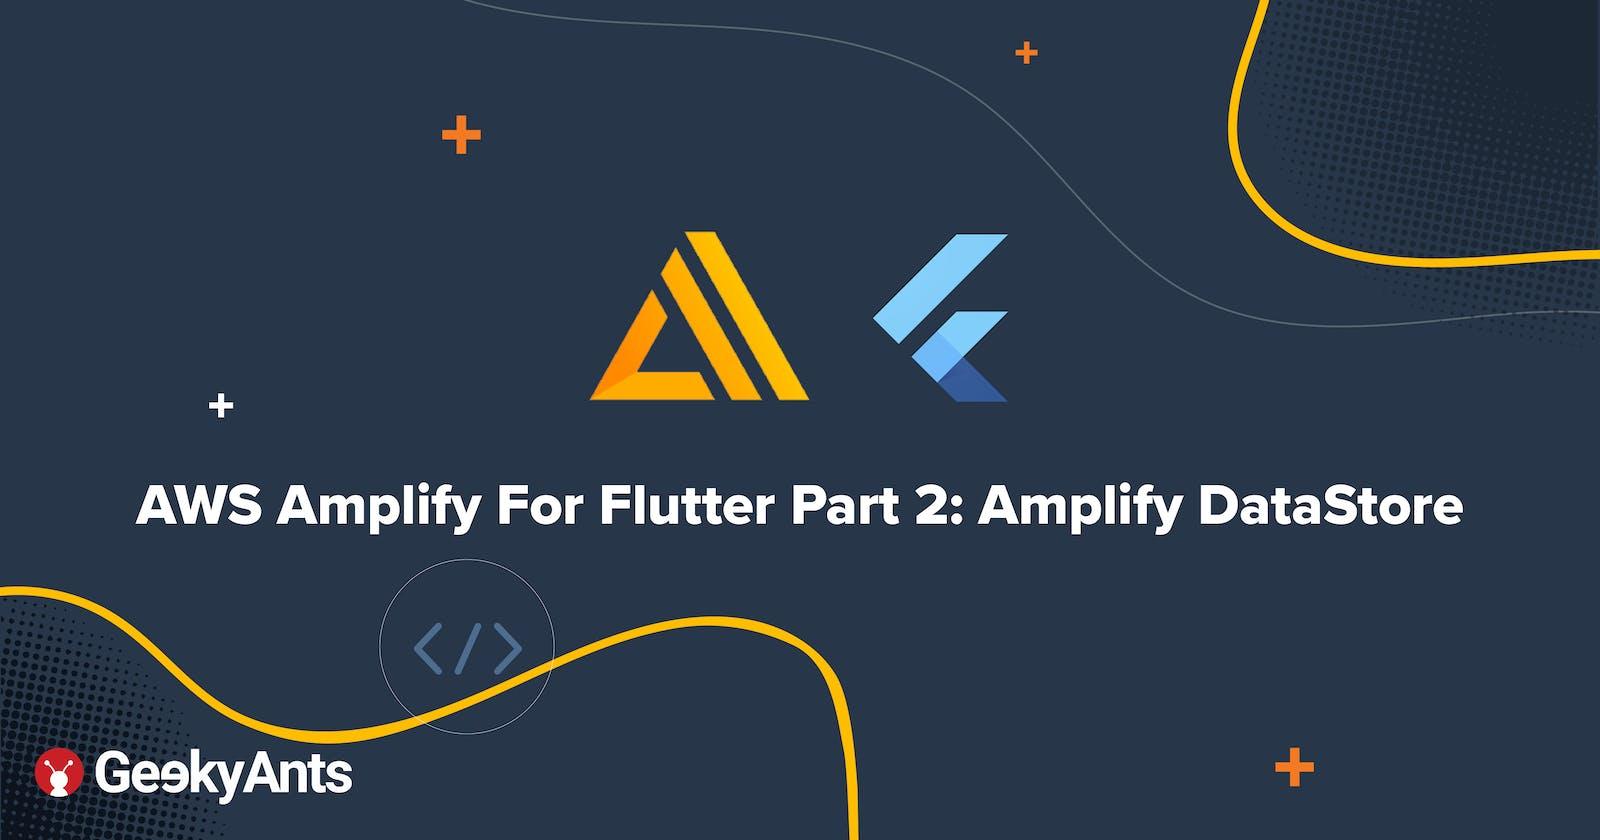 AWS Amplify For Flutter Part 2: Amplify DataStore